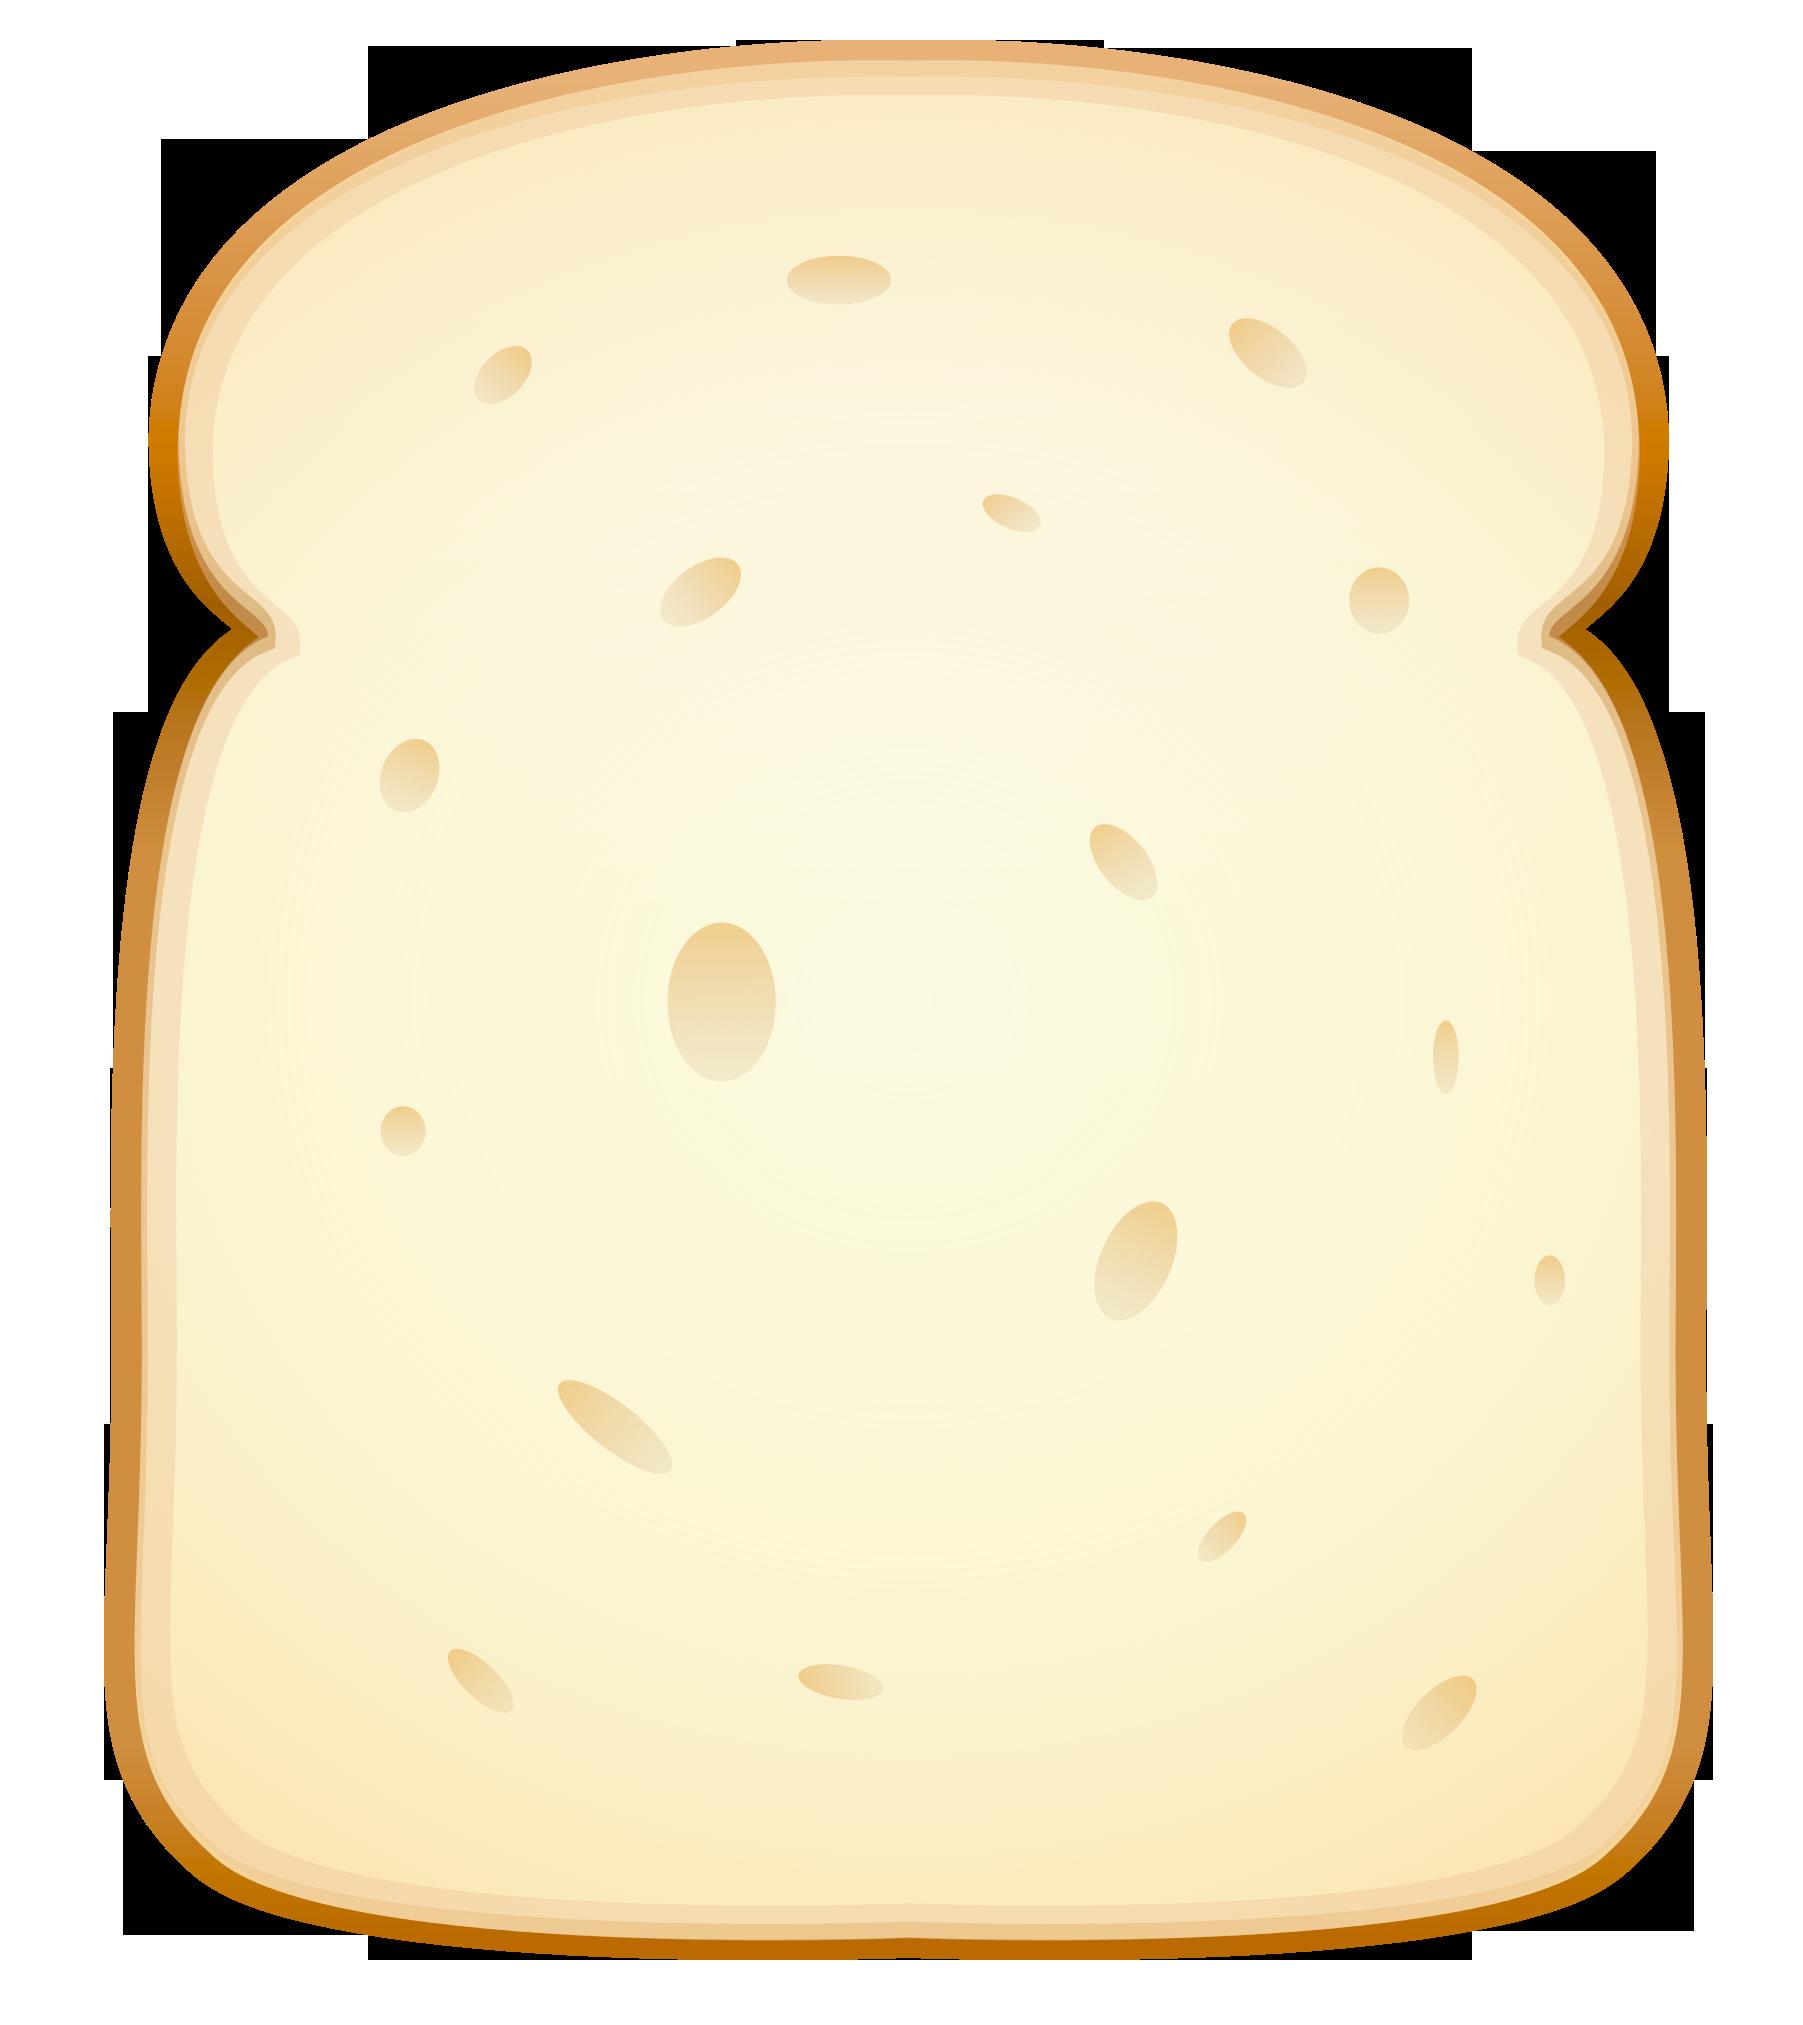 Bread Vector Png Image Food Illustration Design Printable Activities For Kids Food Cartoon